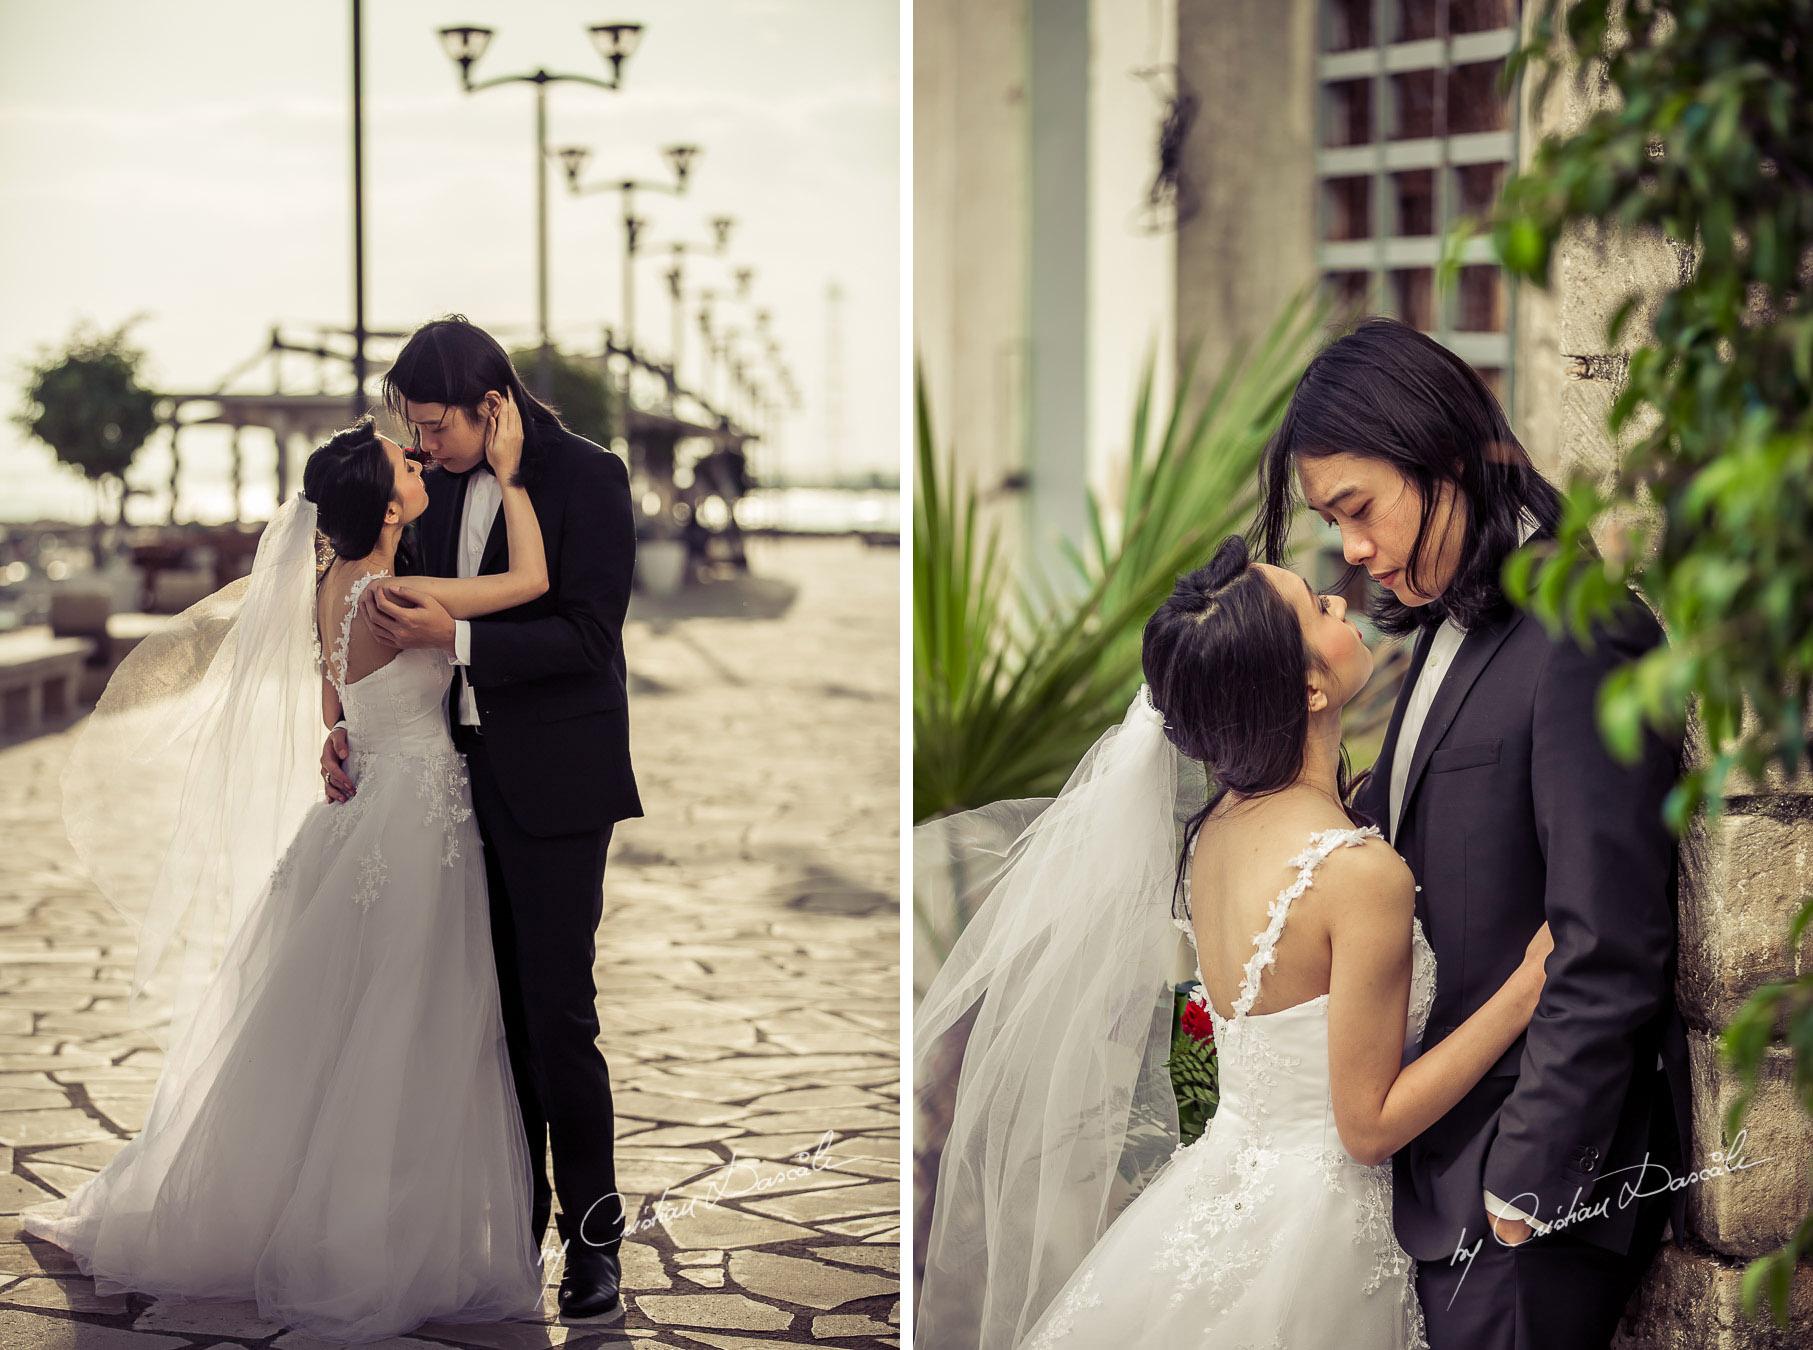 Pre Wedding Photoshoot in Cyprus - 05